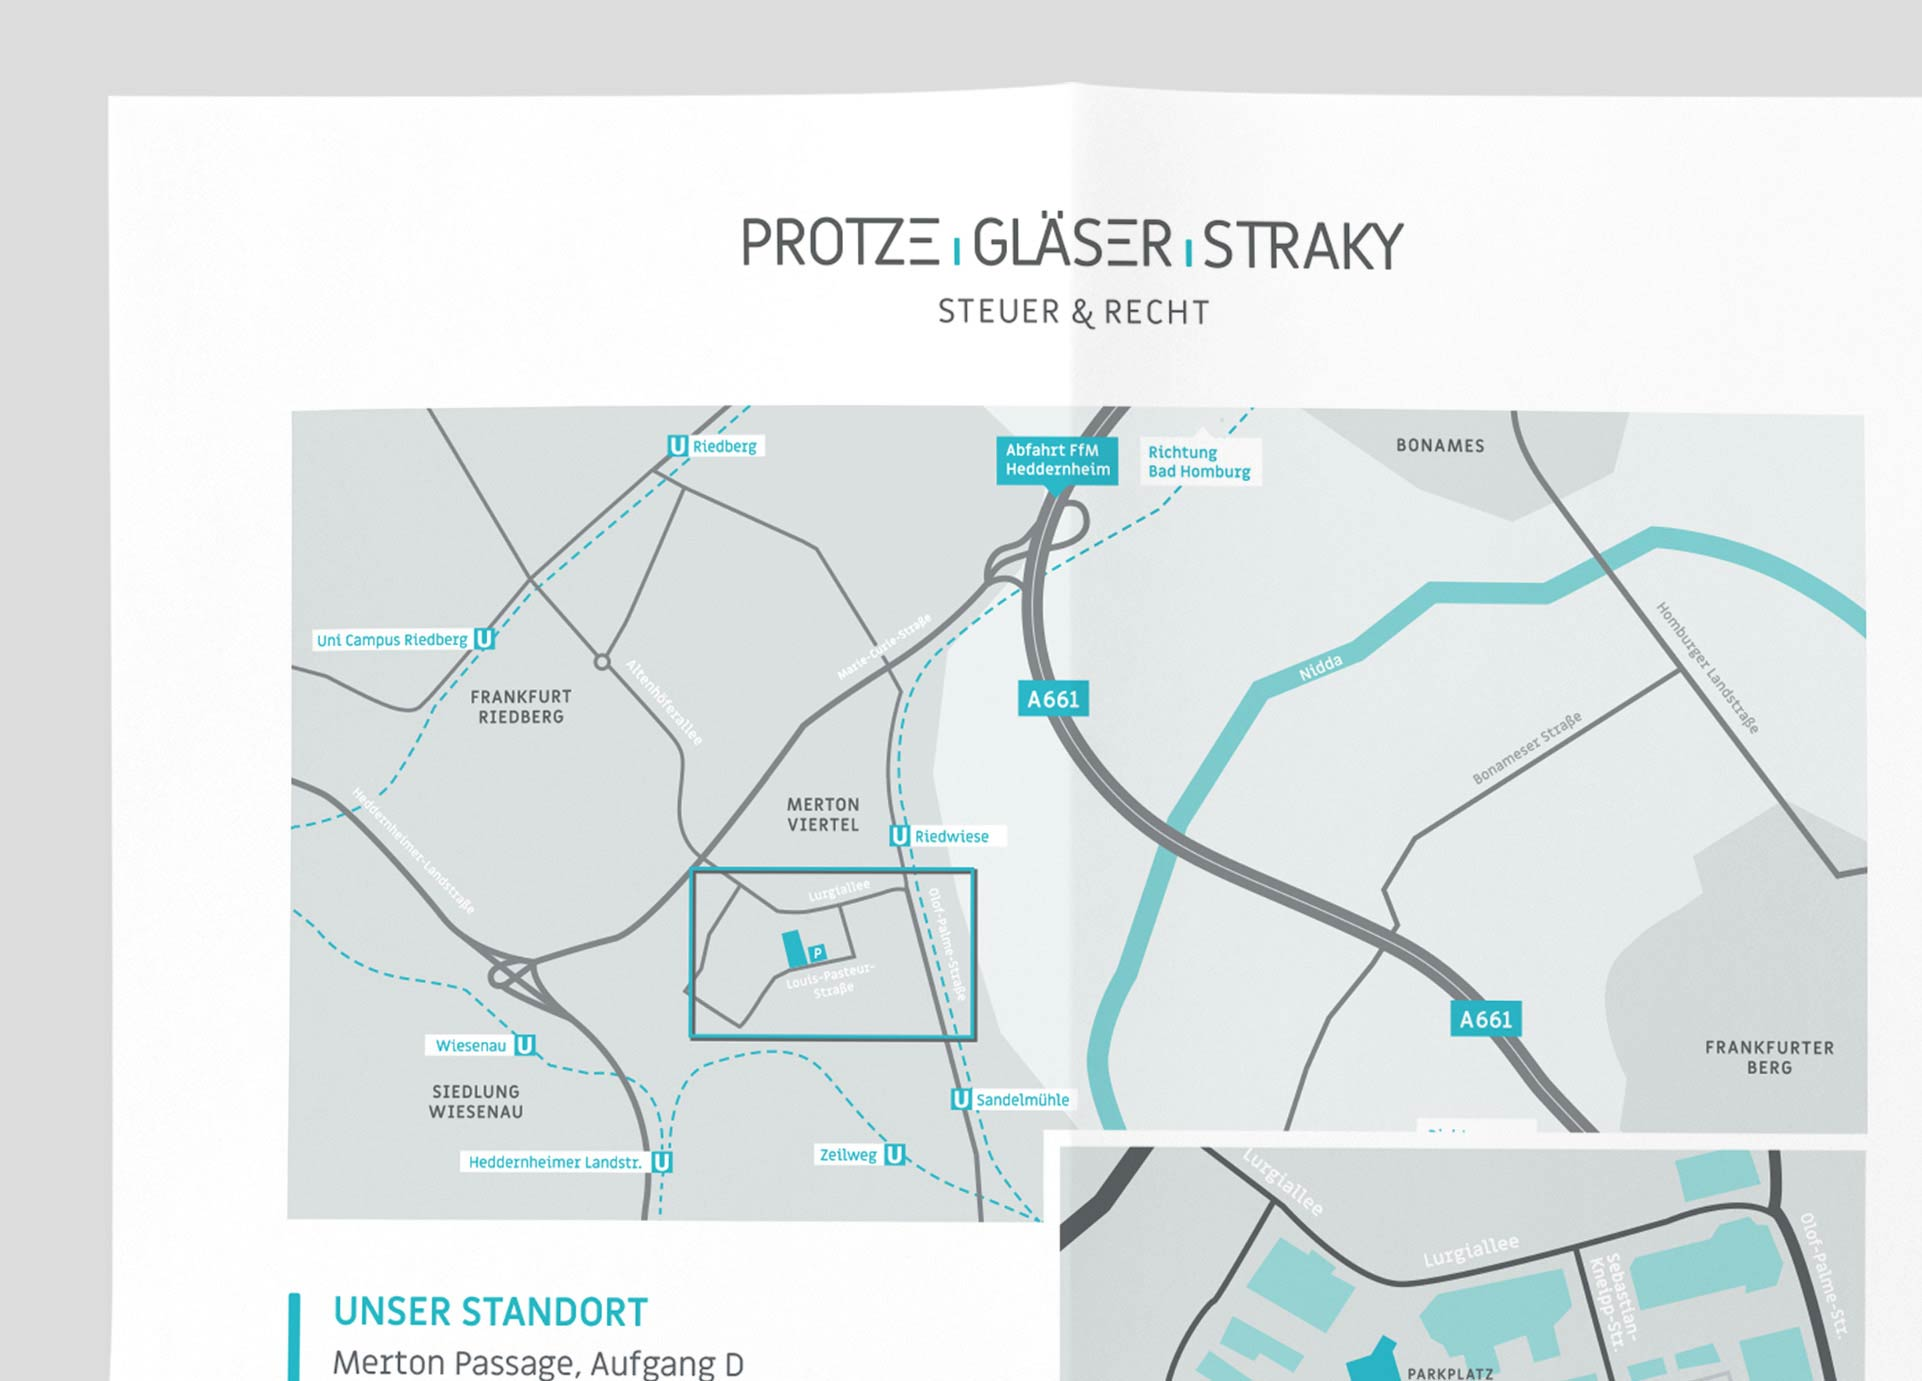 Kartenillustration der Steuerkanzlei PROTZE GLÄSER STRAKY aus Frankfurt am Main